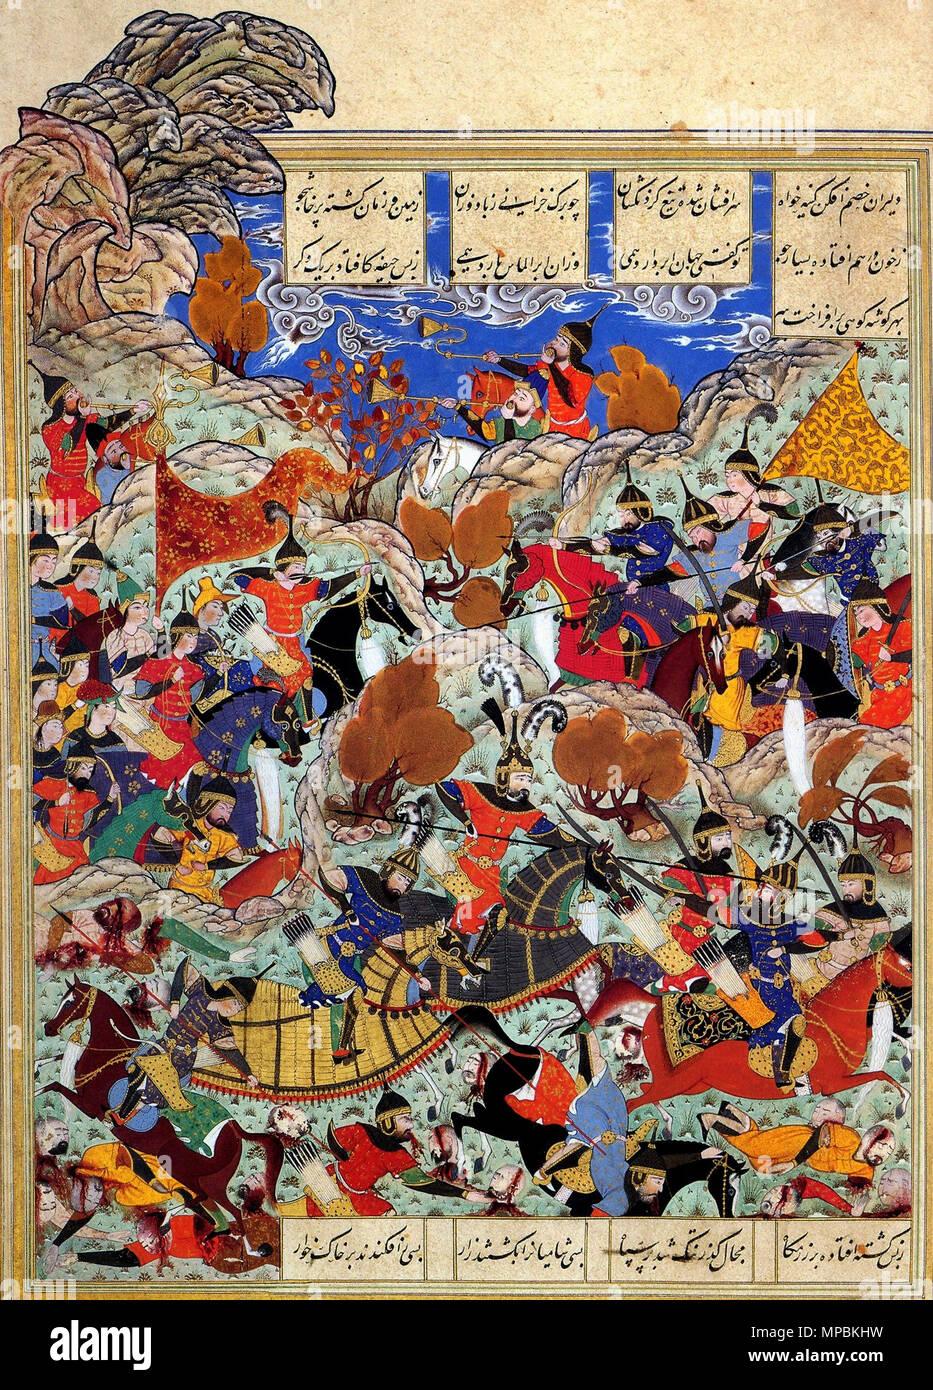 Battleground of Timur and Egyptian King, 1515 - Stock Image